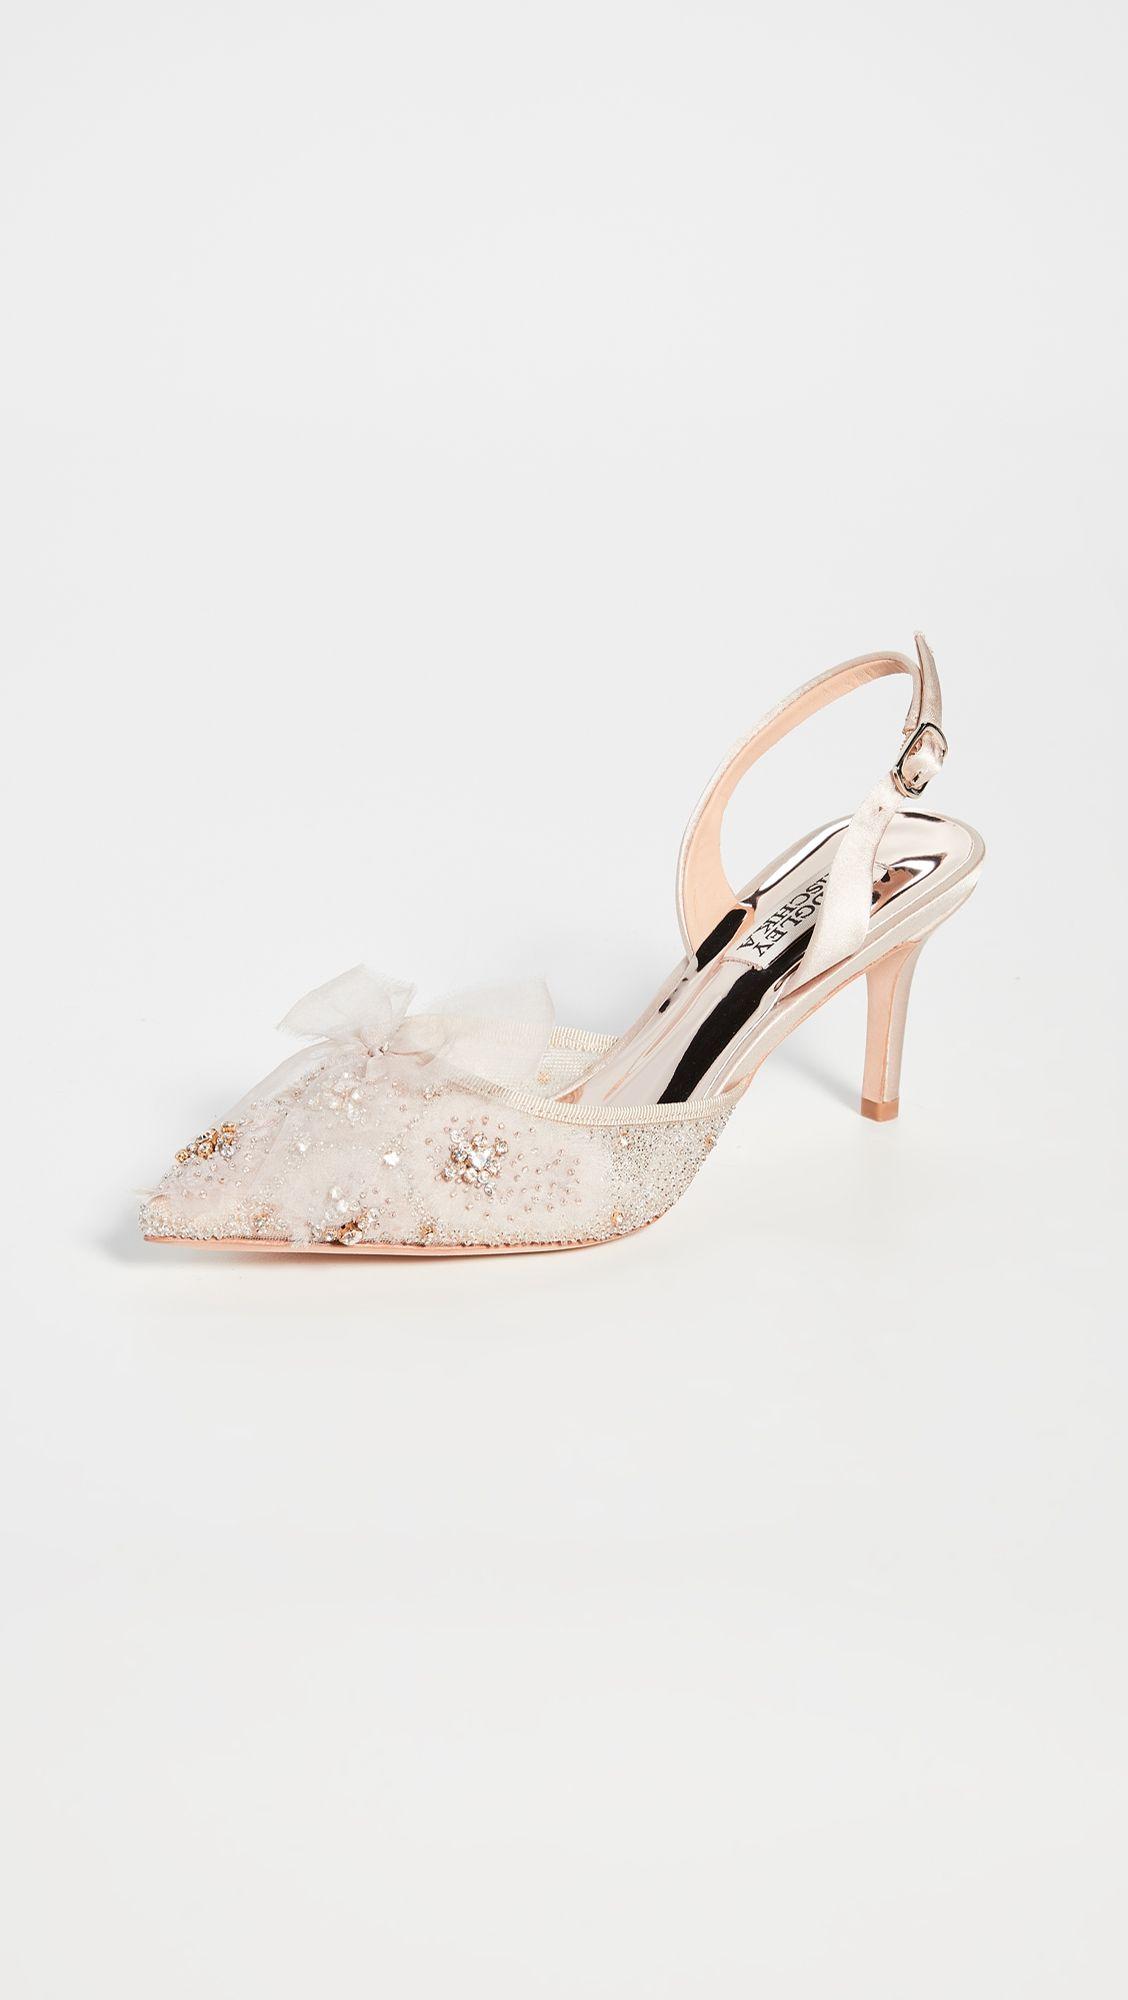 Badgley Mischka Angeline Slingback Pumps Wedding Shoes Pumps Kitten Heel Wedding Shoes Bridal Shoes